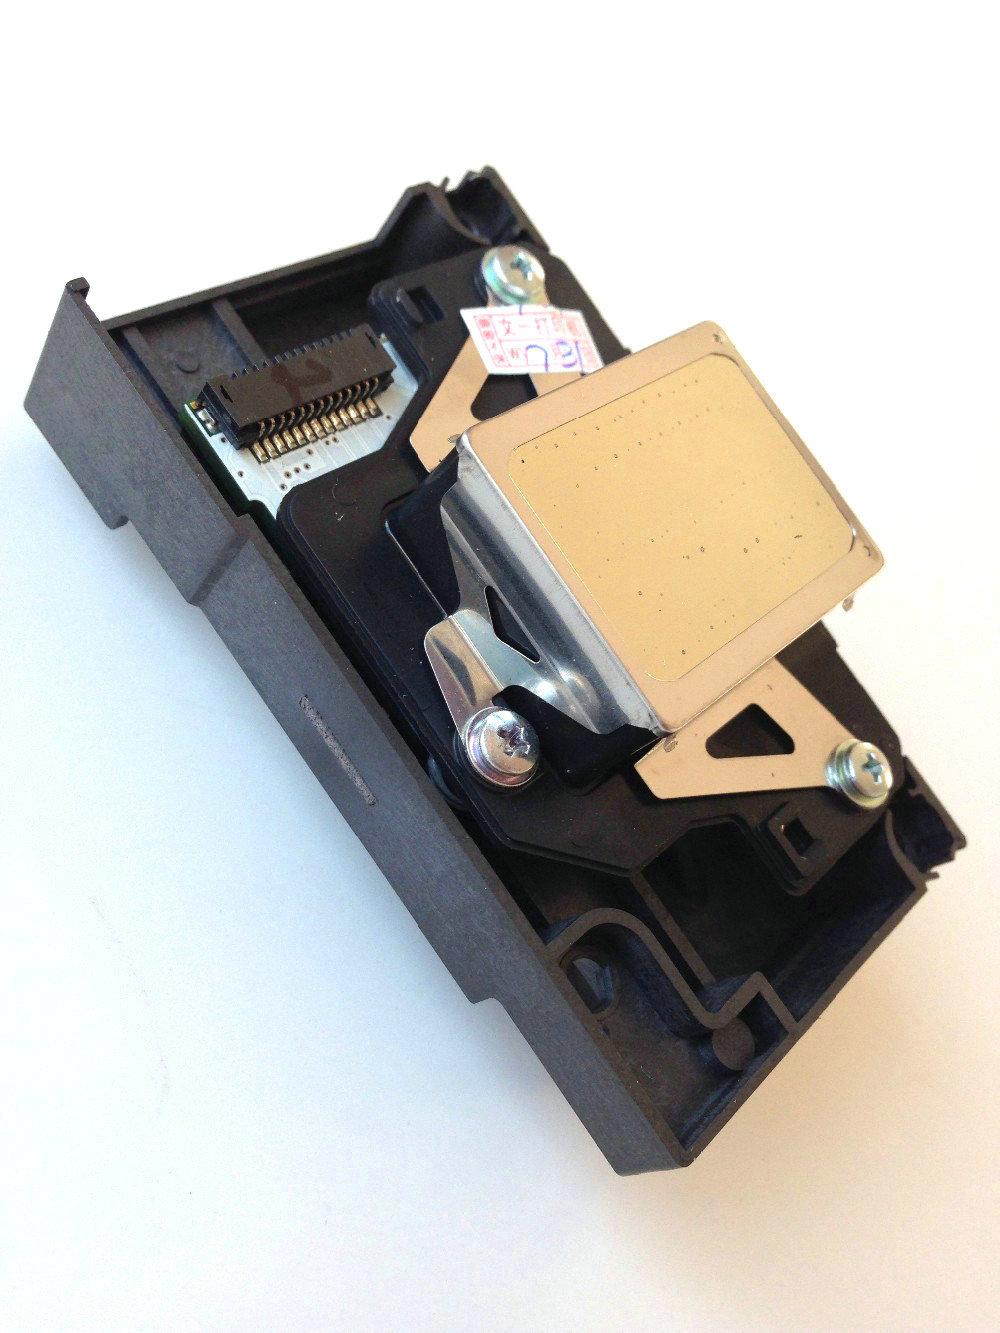 Printhead for Epson R280 R285 R290 R295 R330 RX610 RX690 PX660 PX610 P50 P60 T50 T60 T59 TX650 L800 L801 F180000